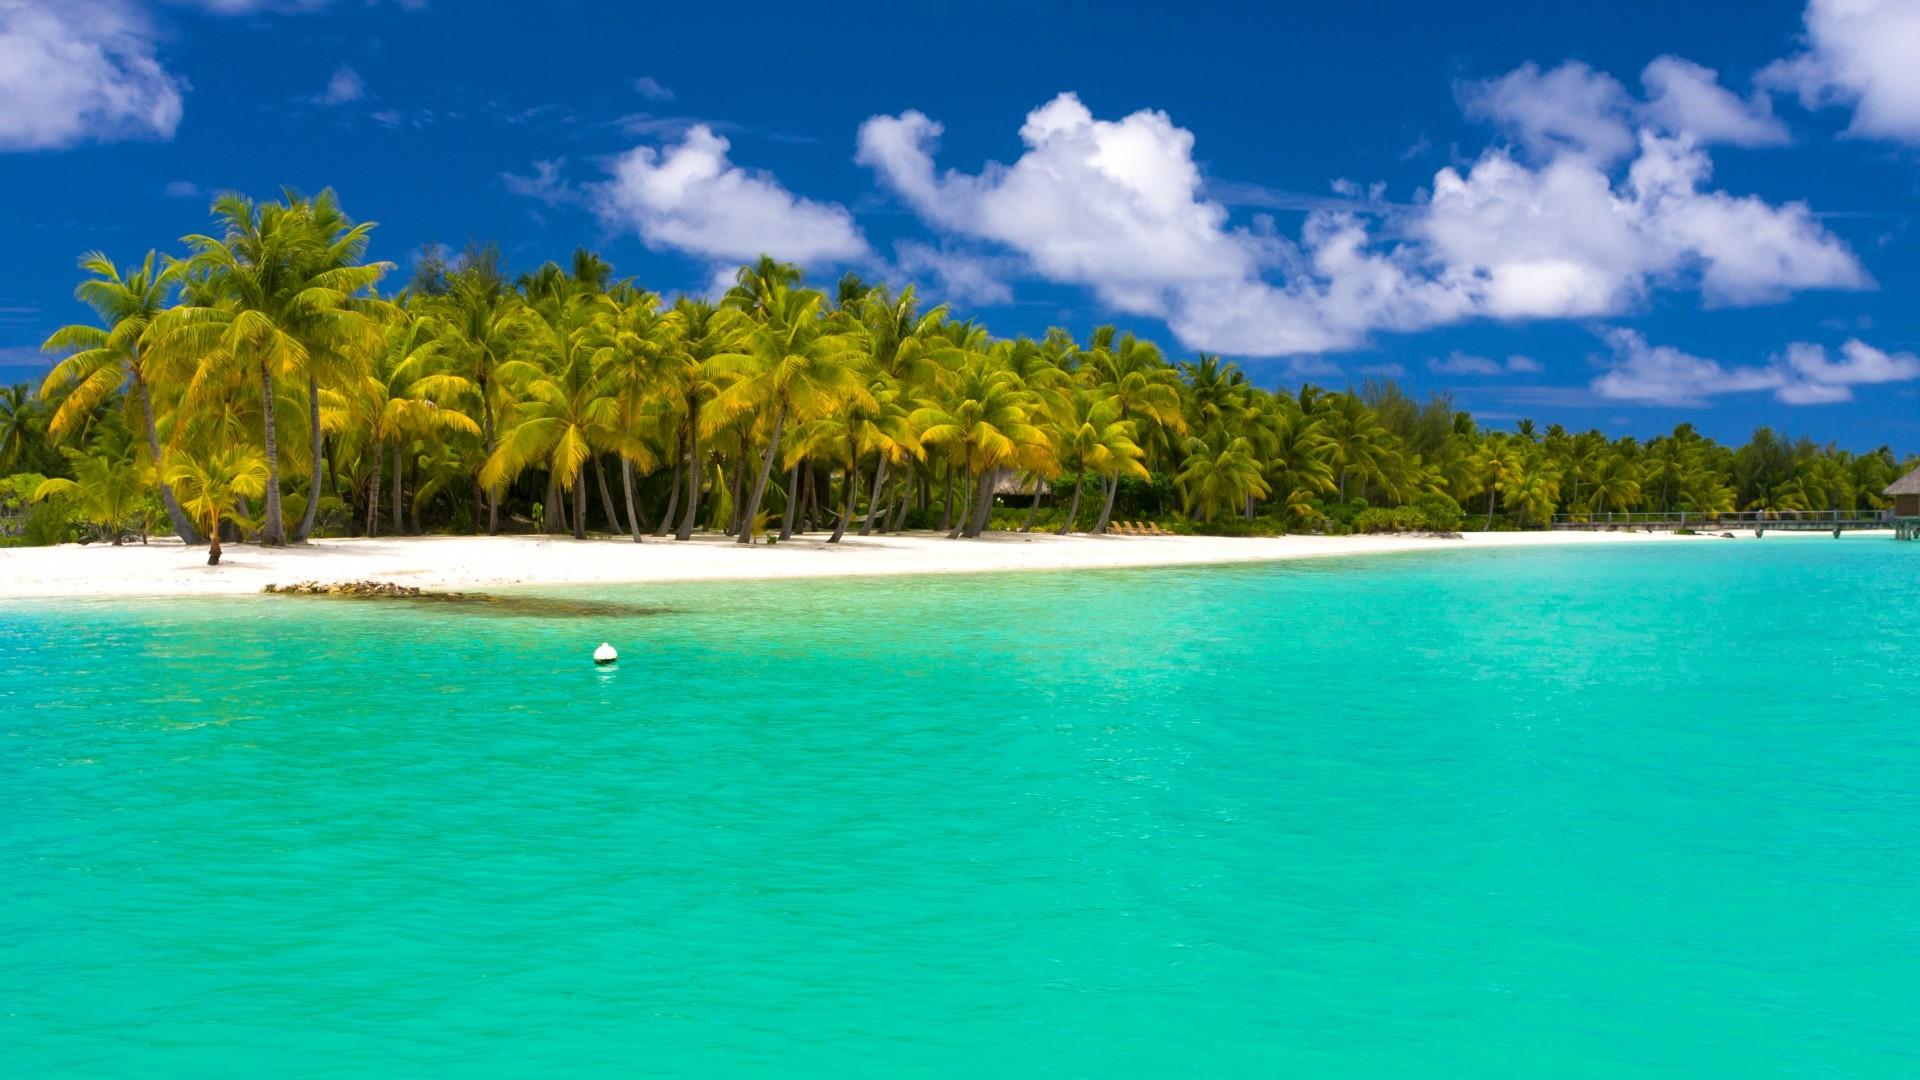 Preview wallpaper summer, maldives, tropical, beach, palm trees 1920×1080